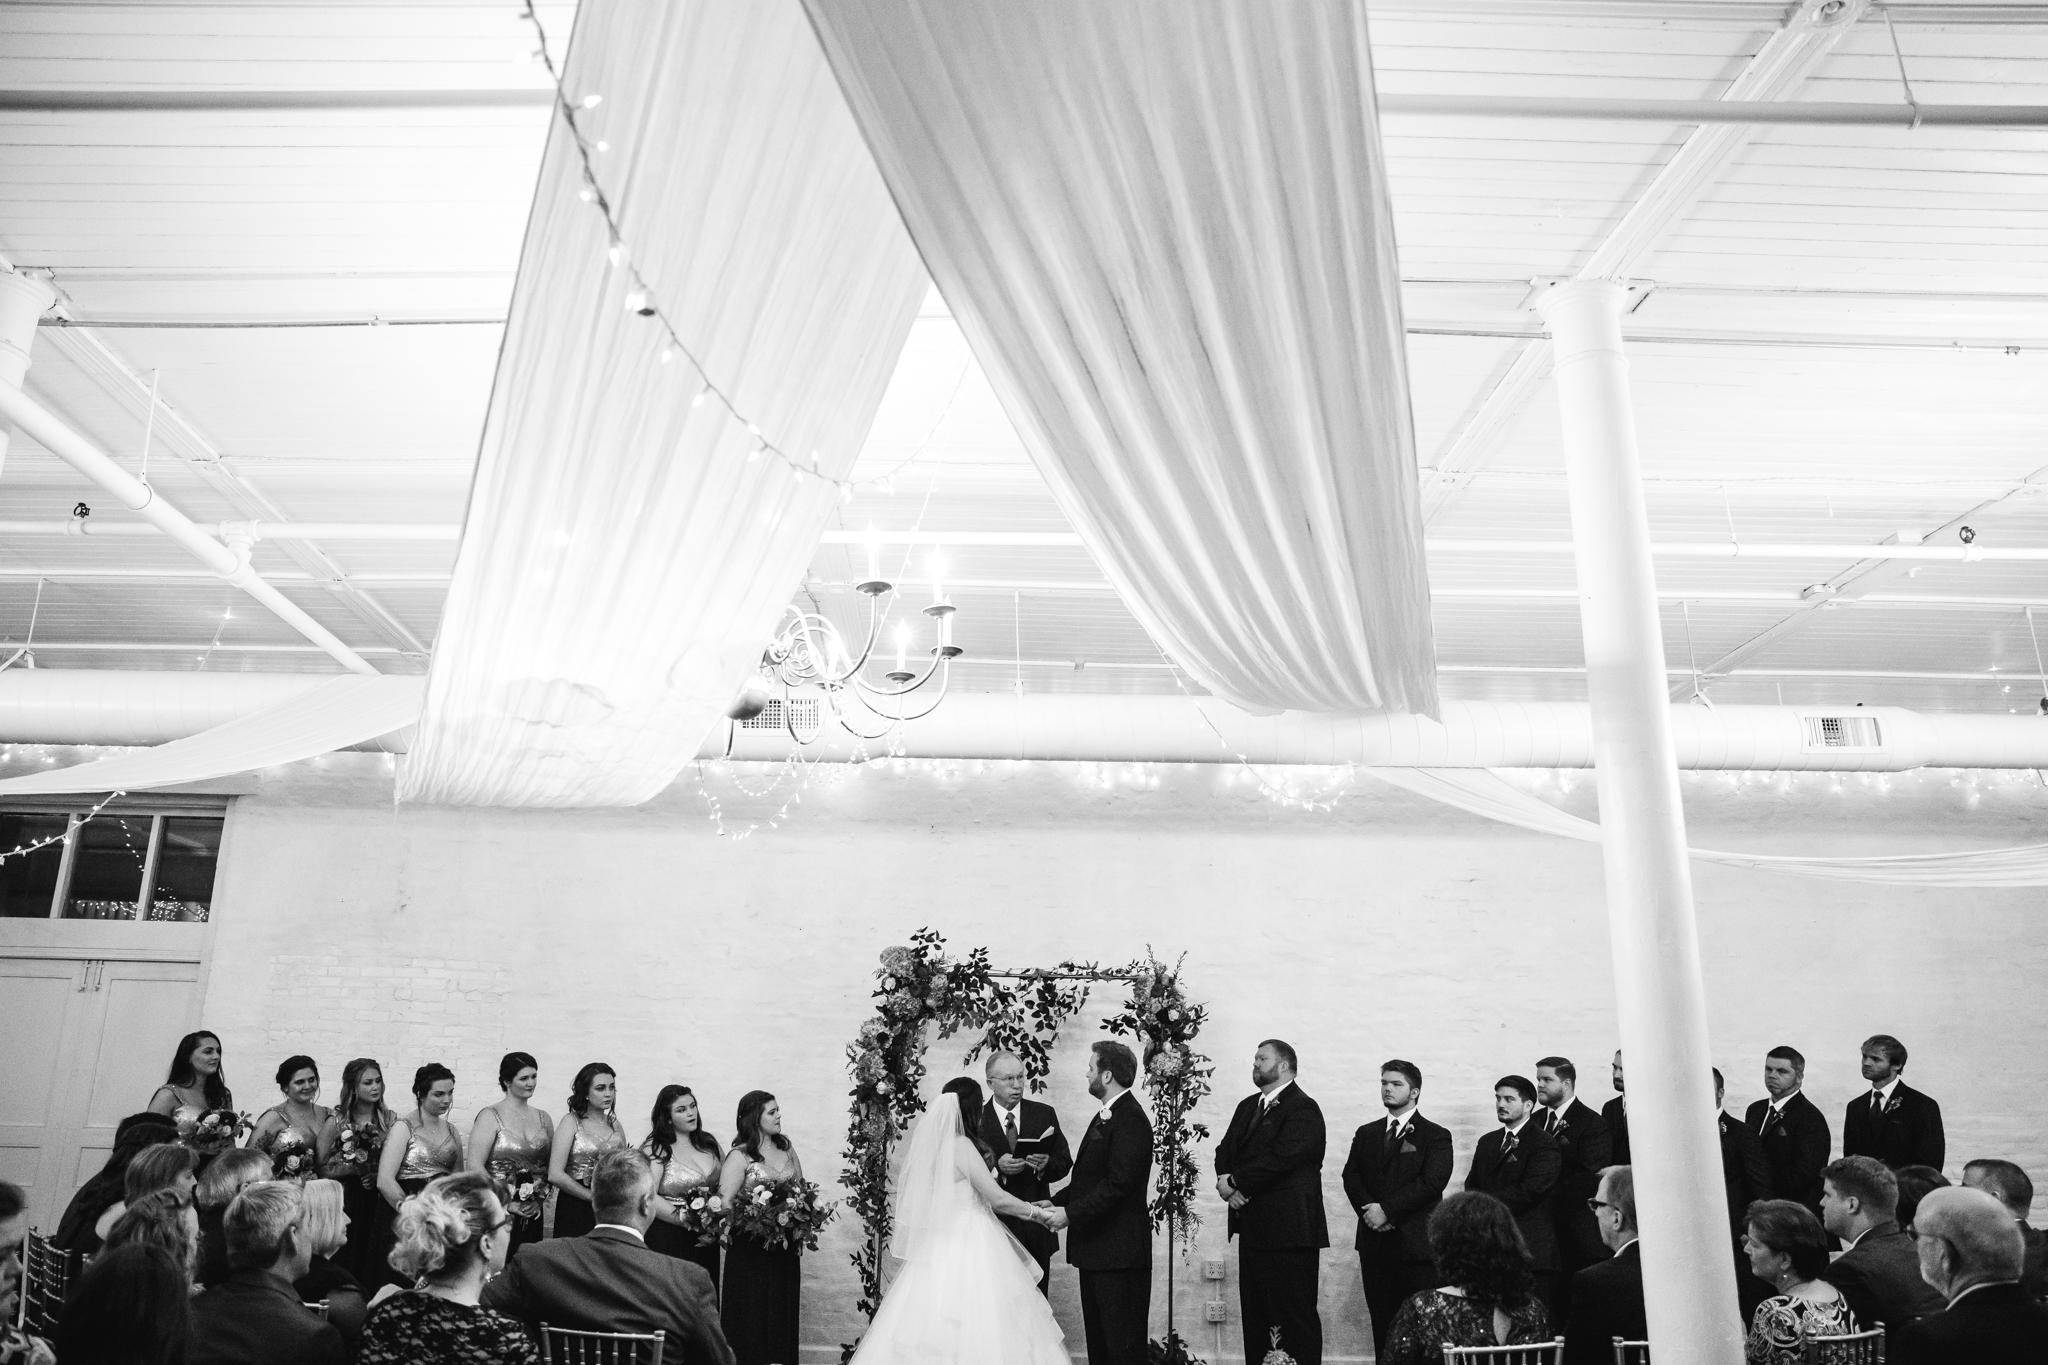 memphis-wedding-photographers-thewarmtharoundyou-ballinese-ballroom (150 of 232).jpg